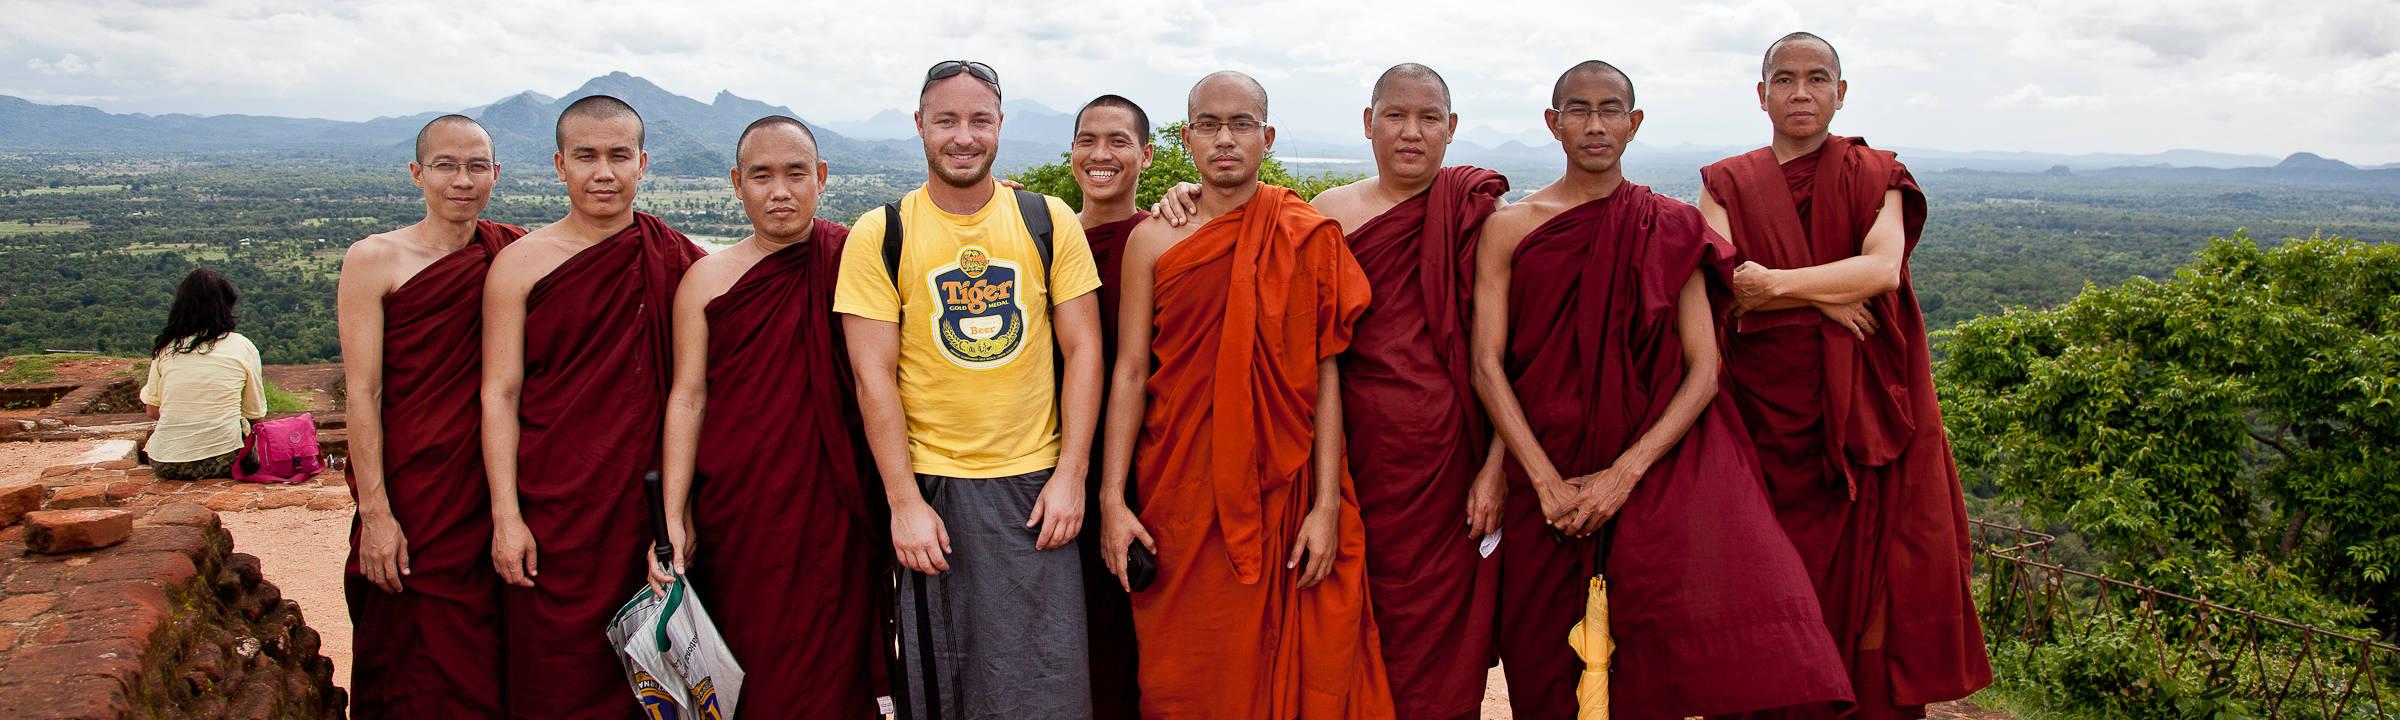 Stunning Sri Lanka: Negombo, Kandy, & Sigiriya